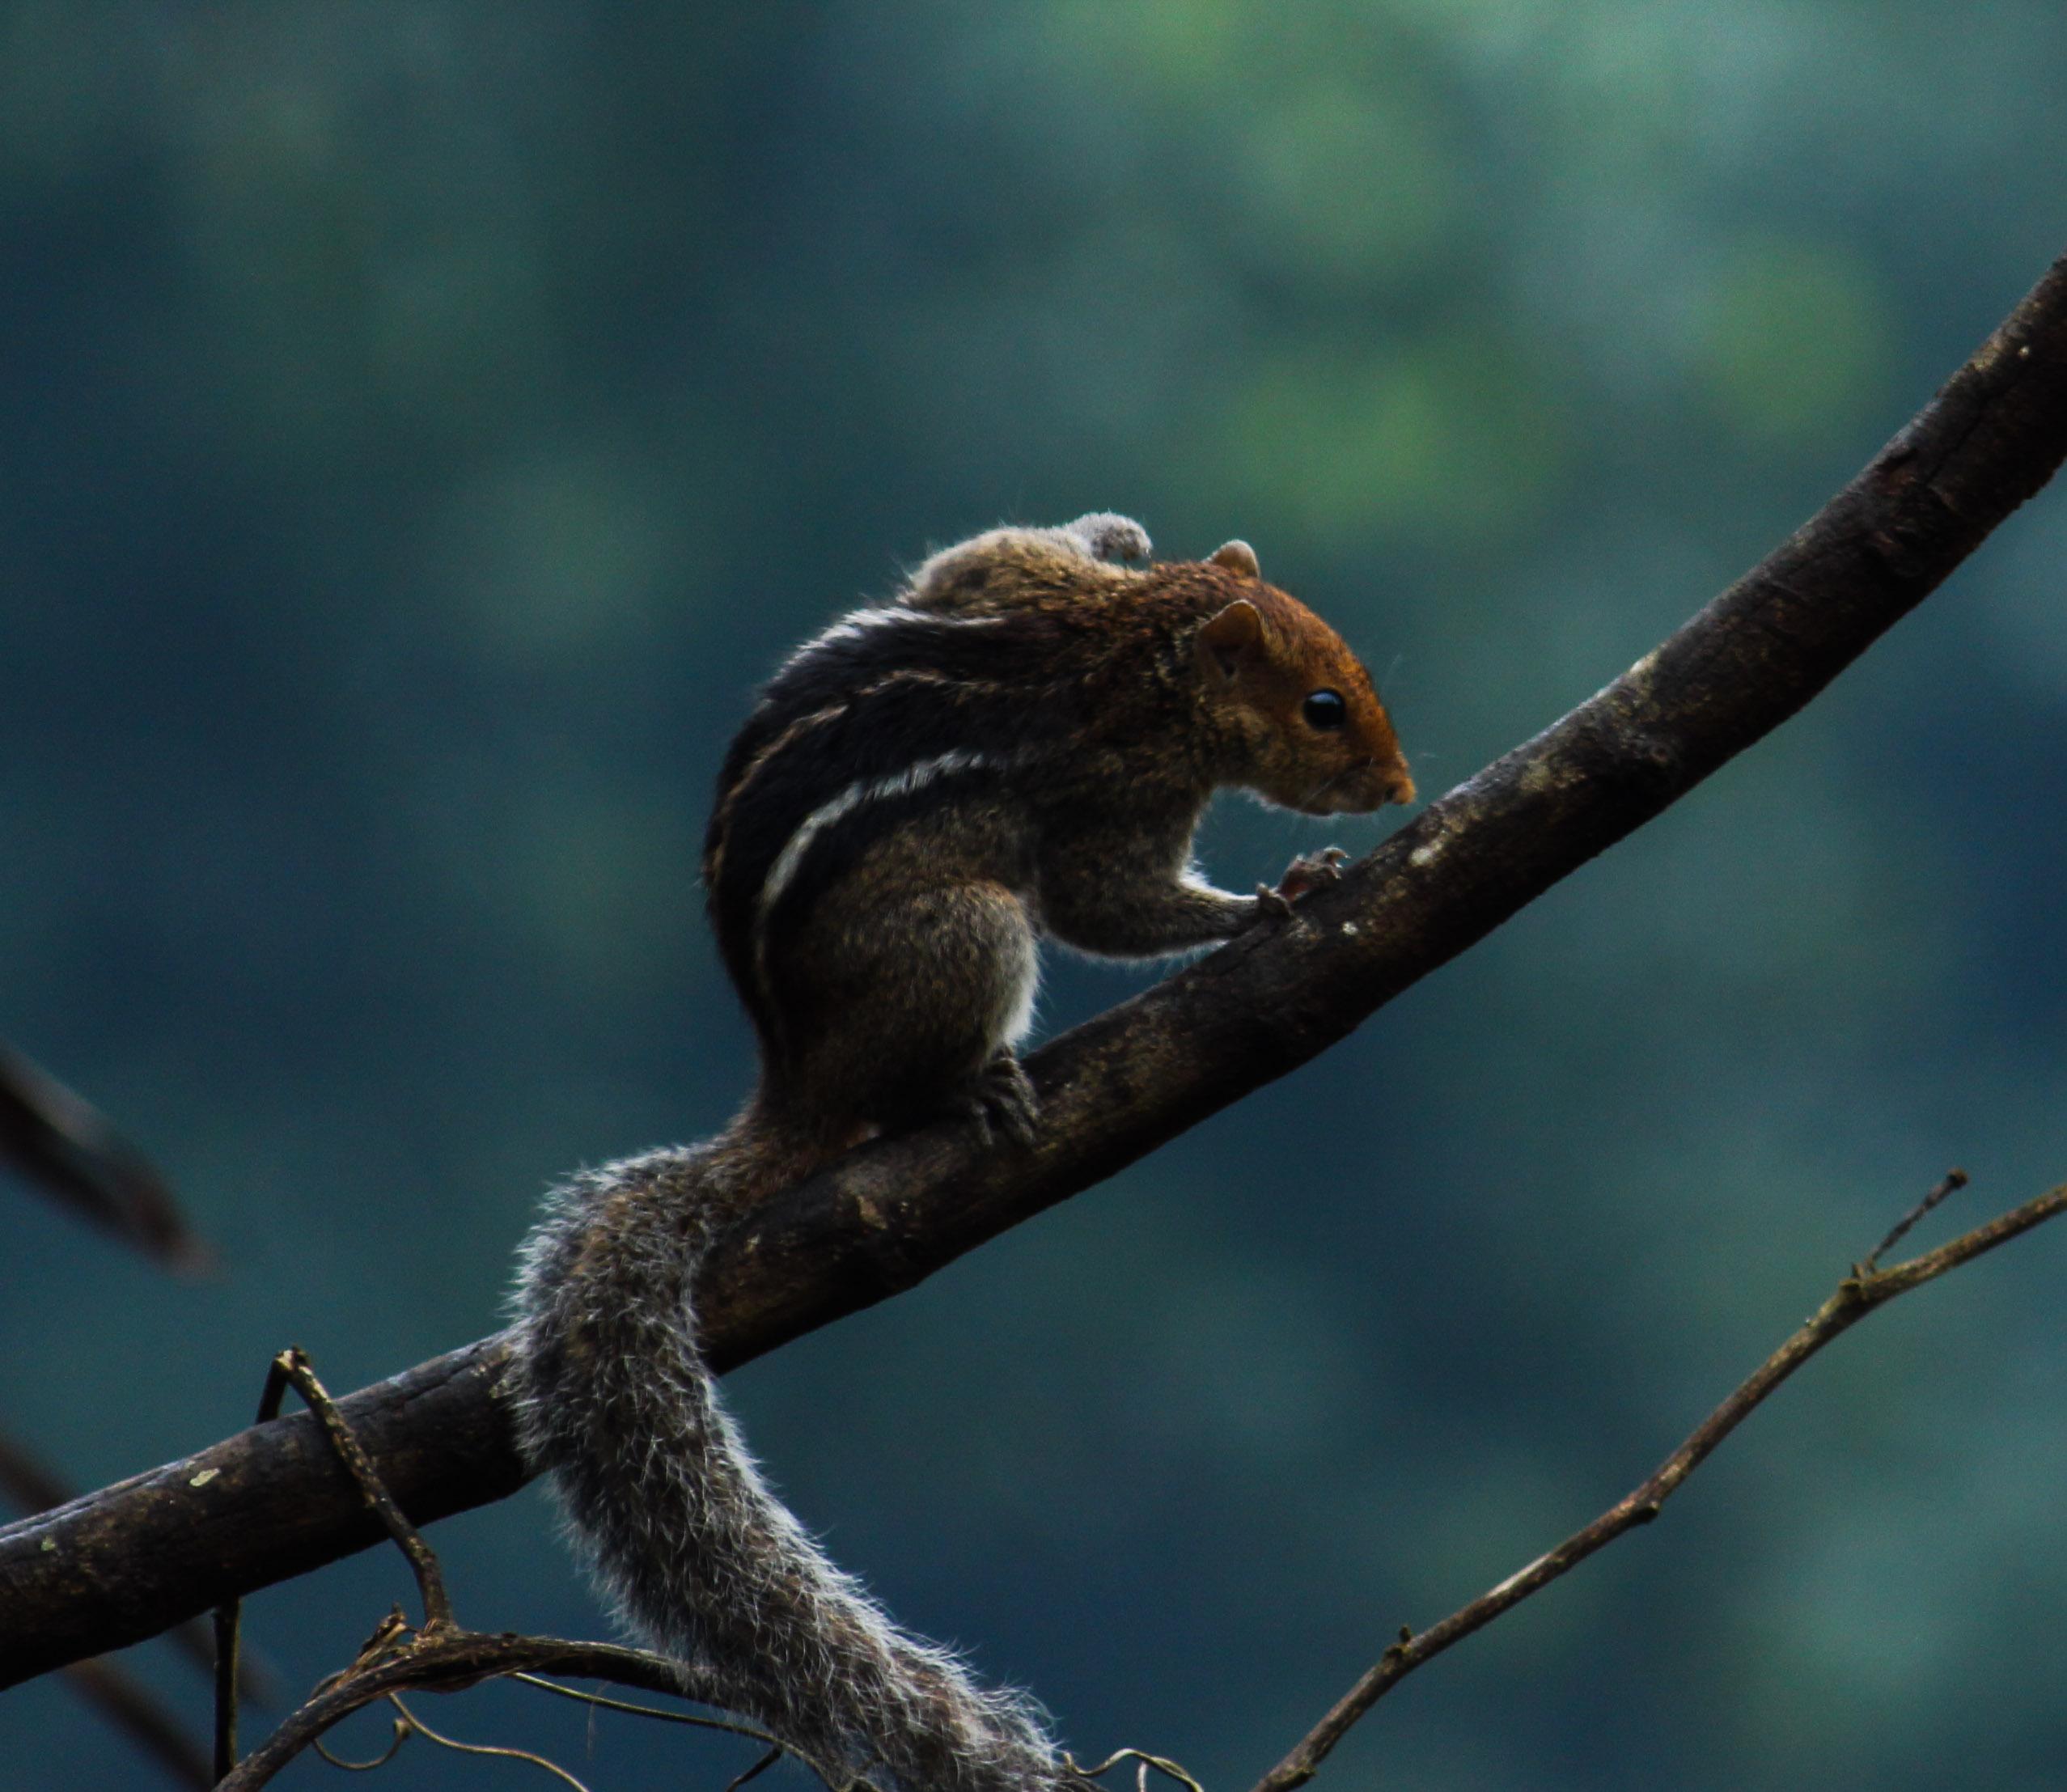 Eastern chipmunks on Tree Branch